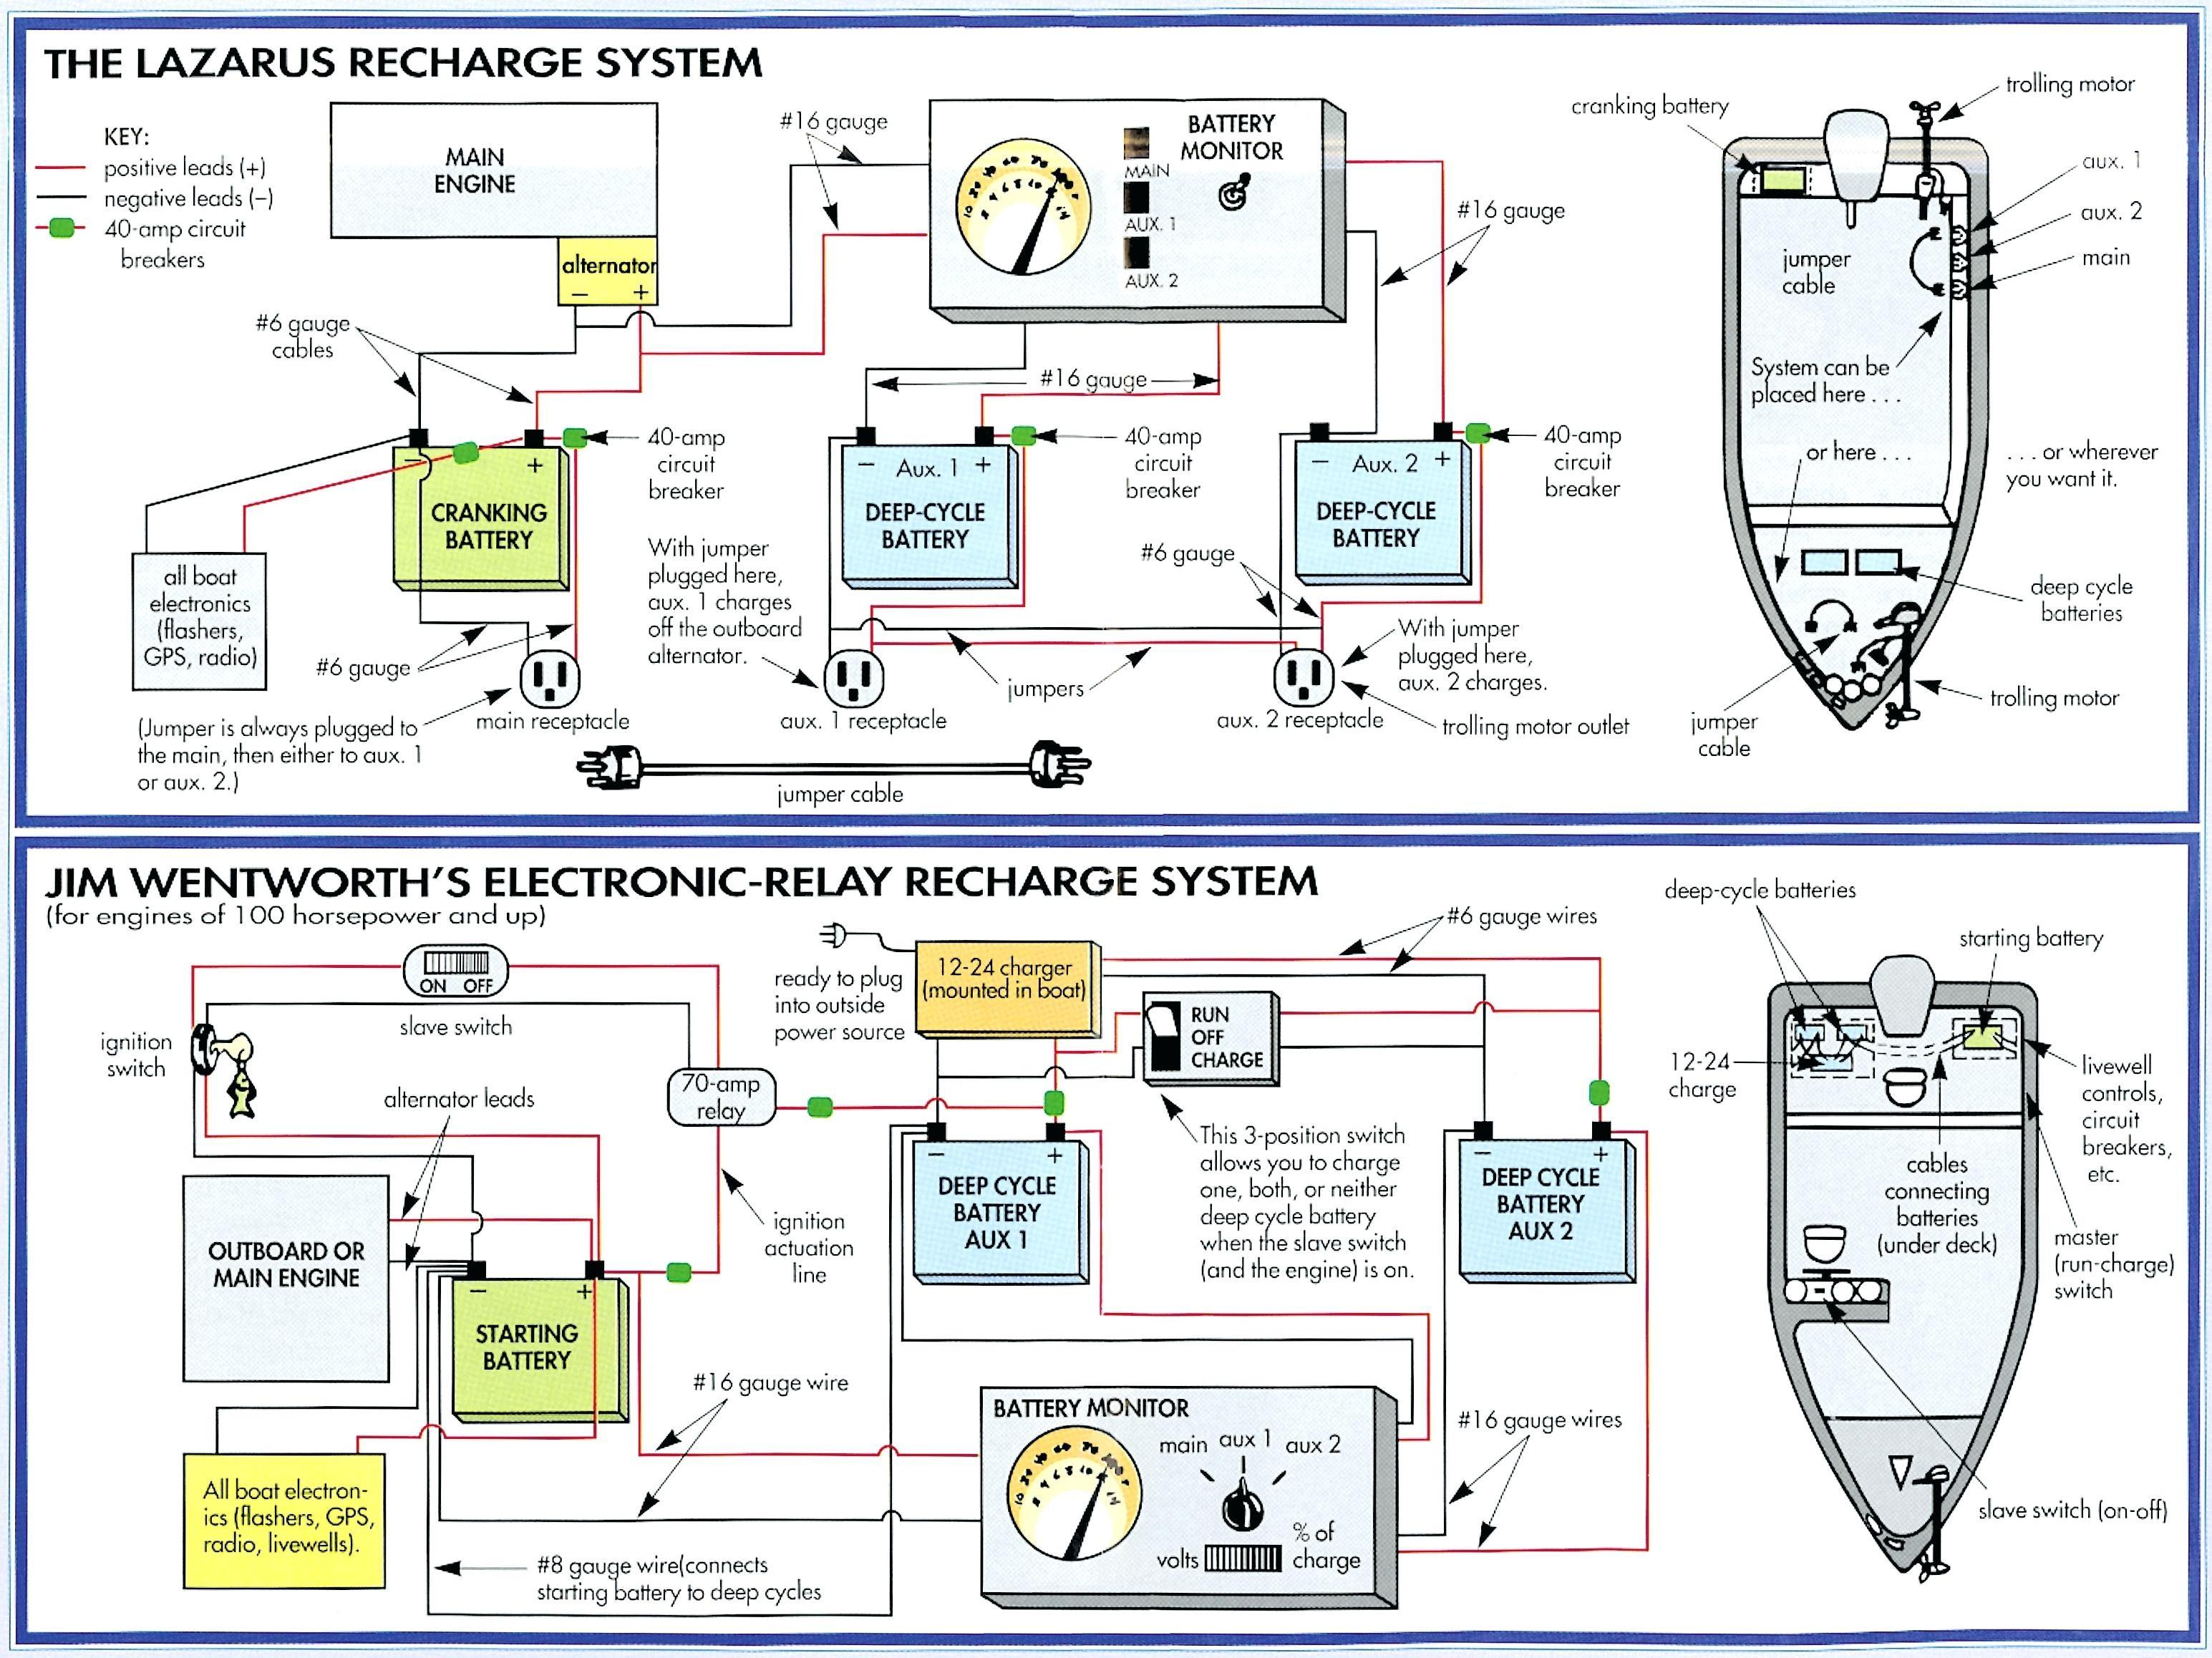 Rl 8342 Wiring Diagram Also Perko Dual Battery Switch Wiring Diagram On Blue Wiring Diagram